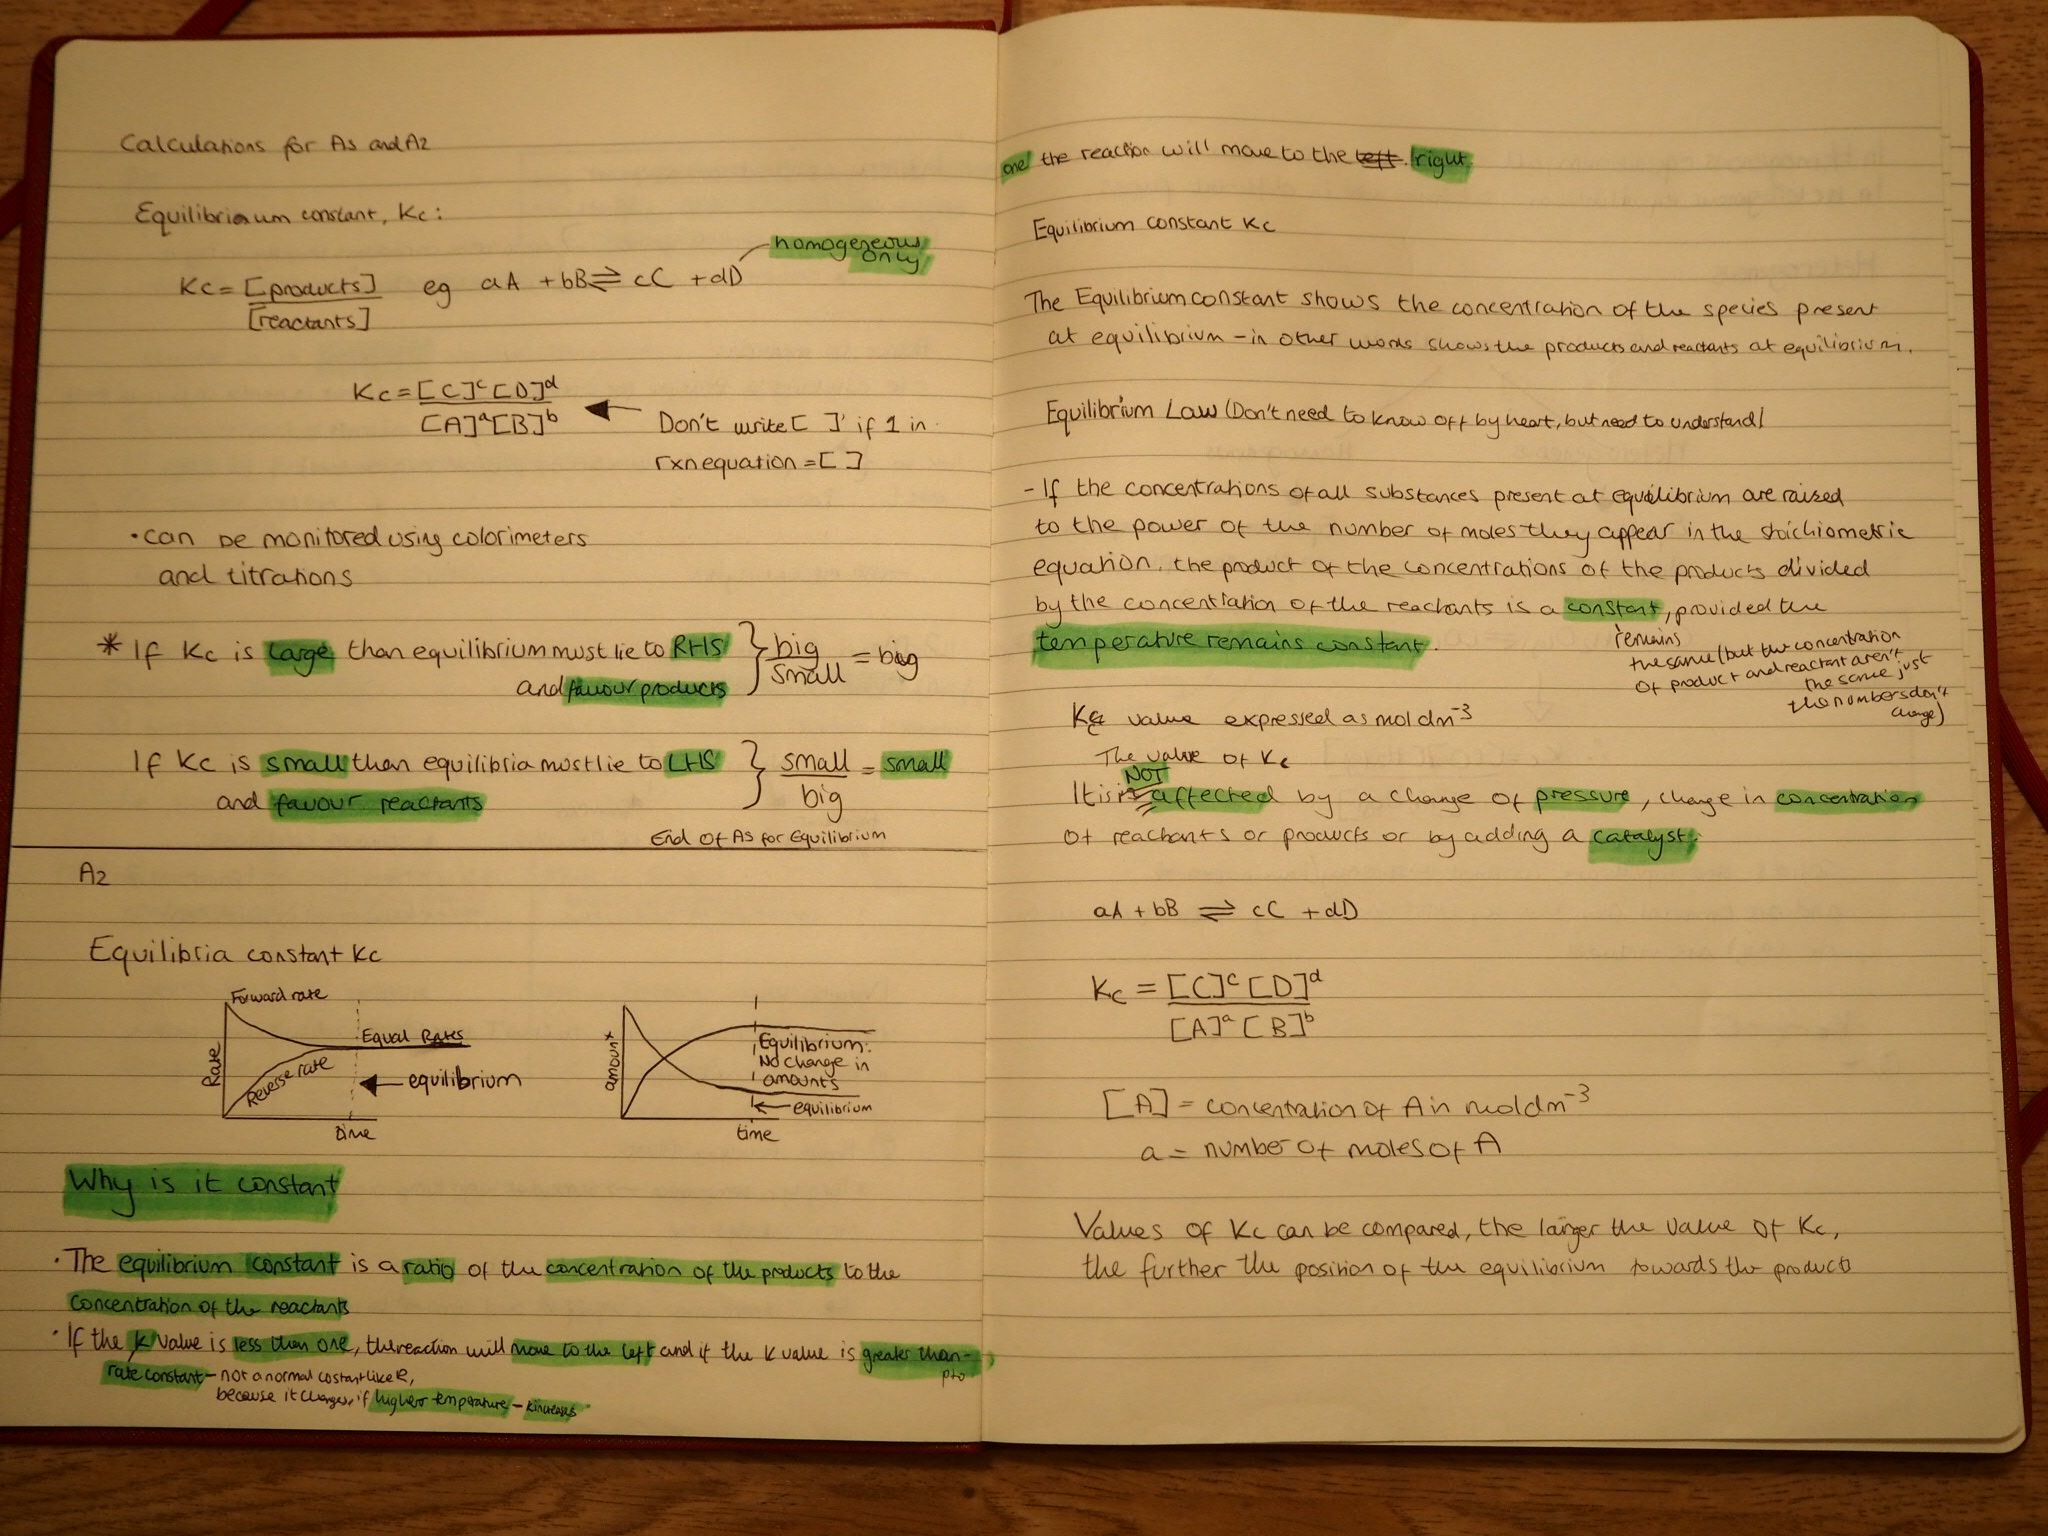 AS equilibrium notes part 2 and part 1 of Equilibrium ...